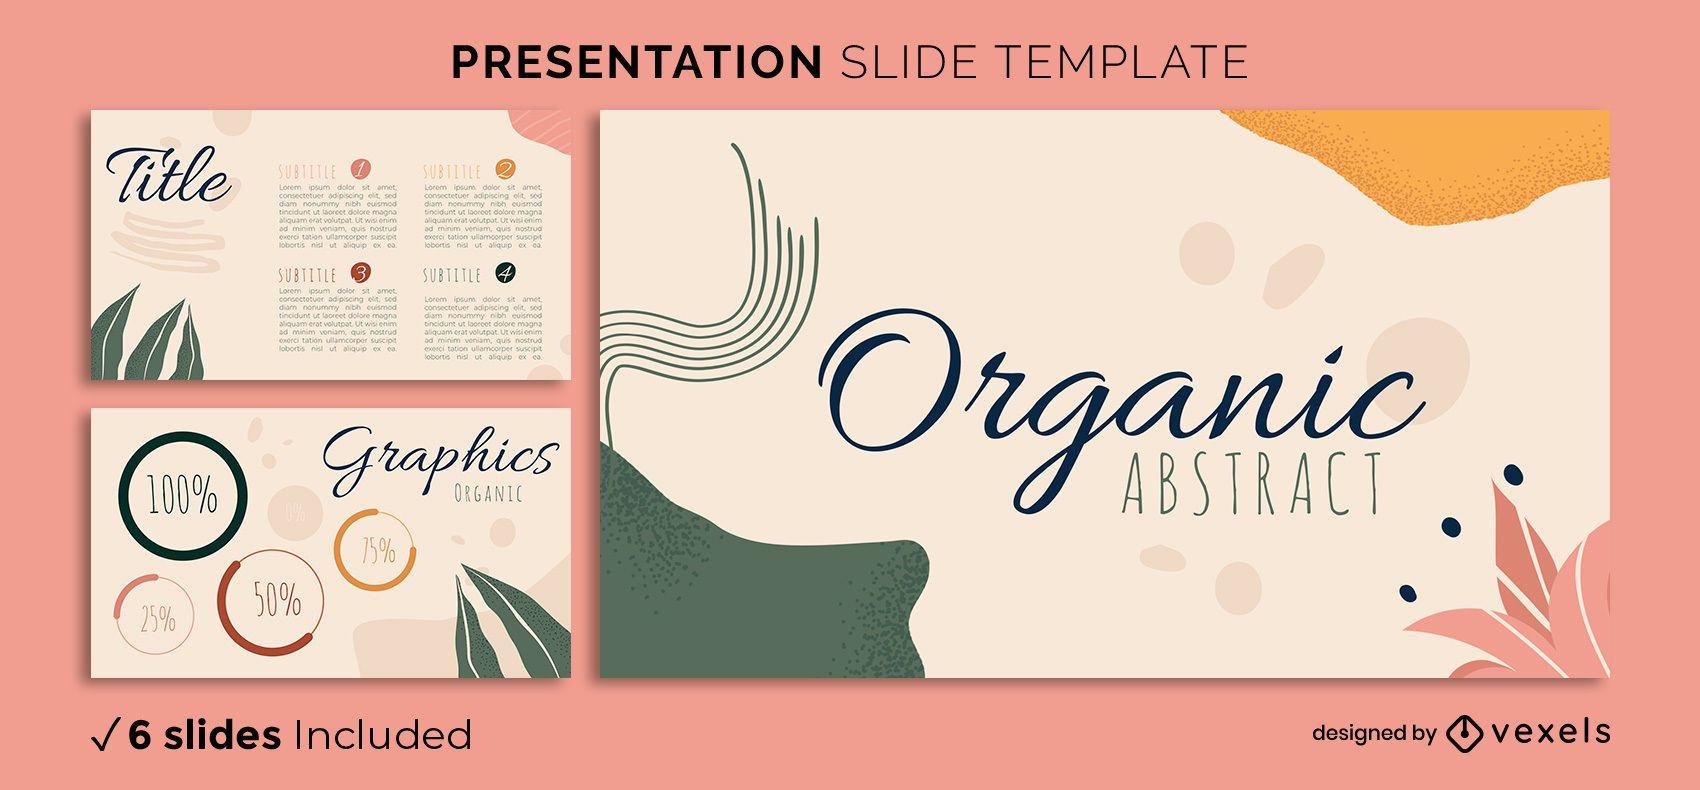 Organic Abstract Presentation Template